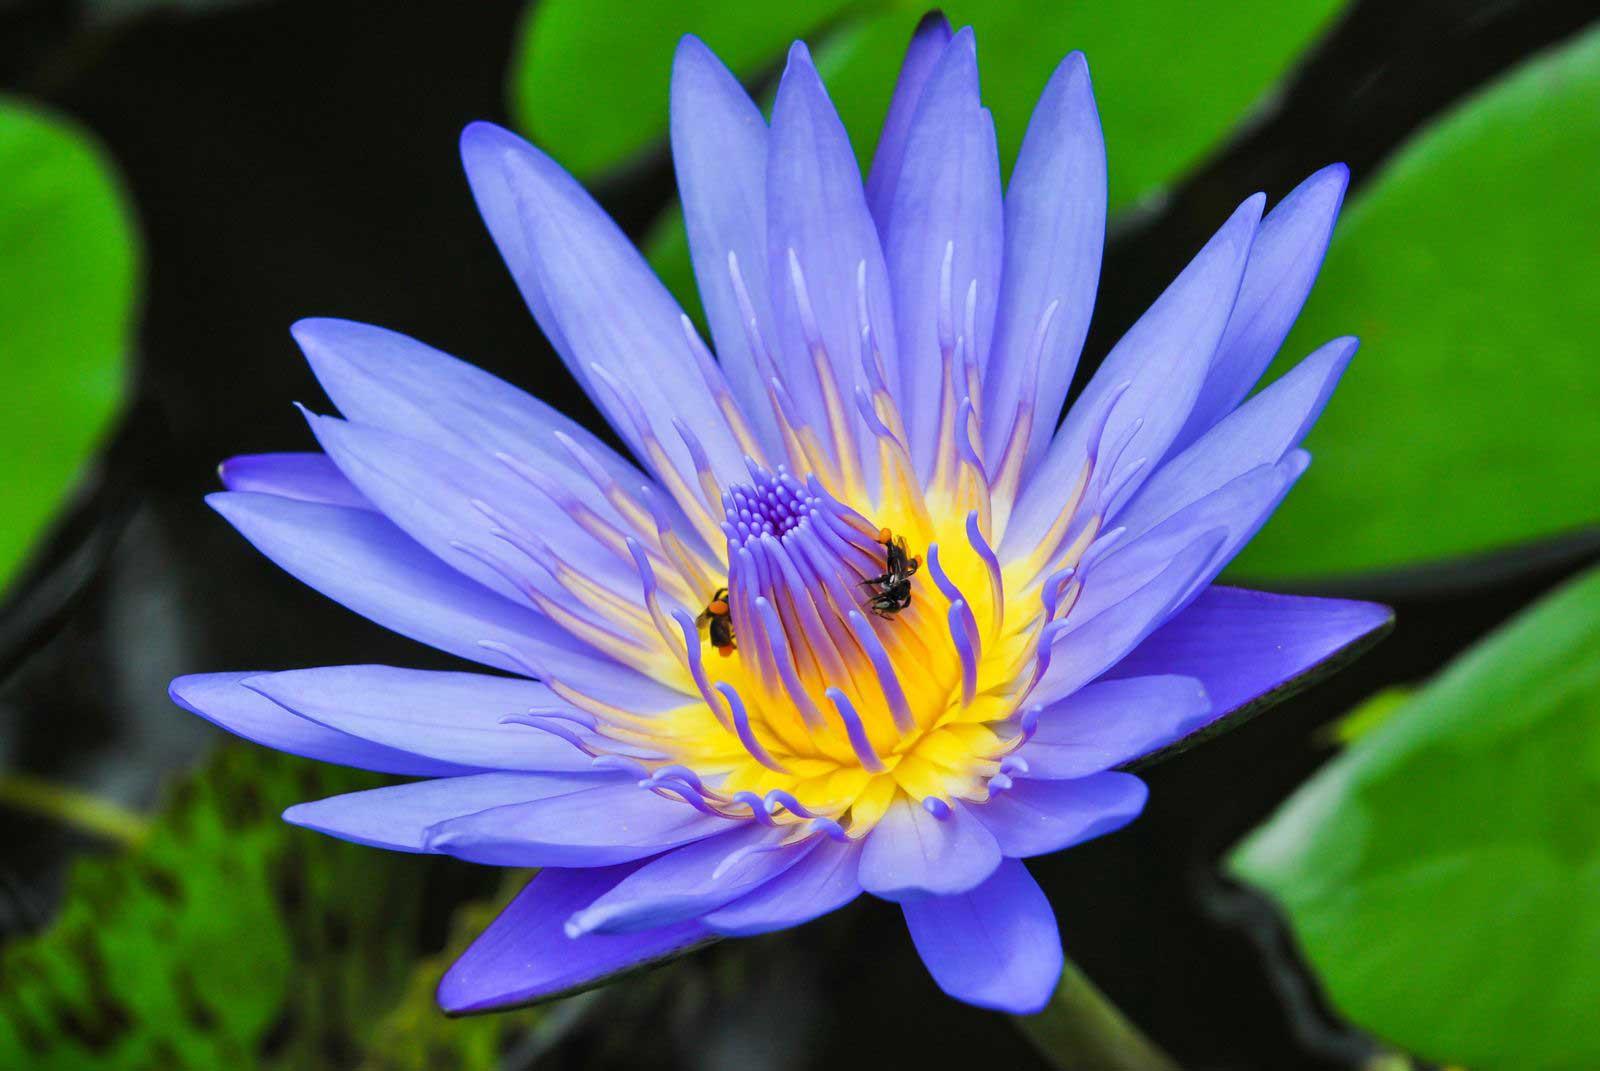 Flor de Lótus azul